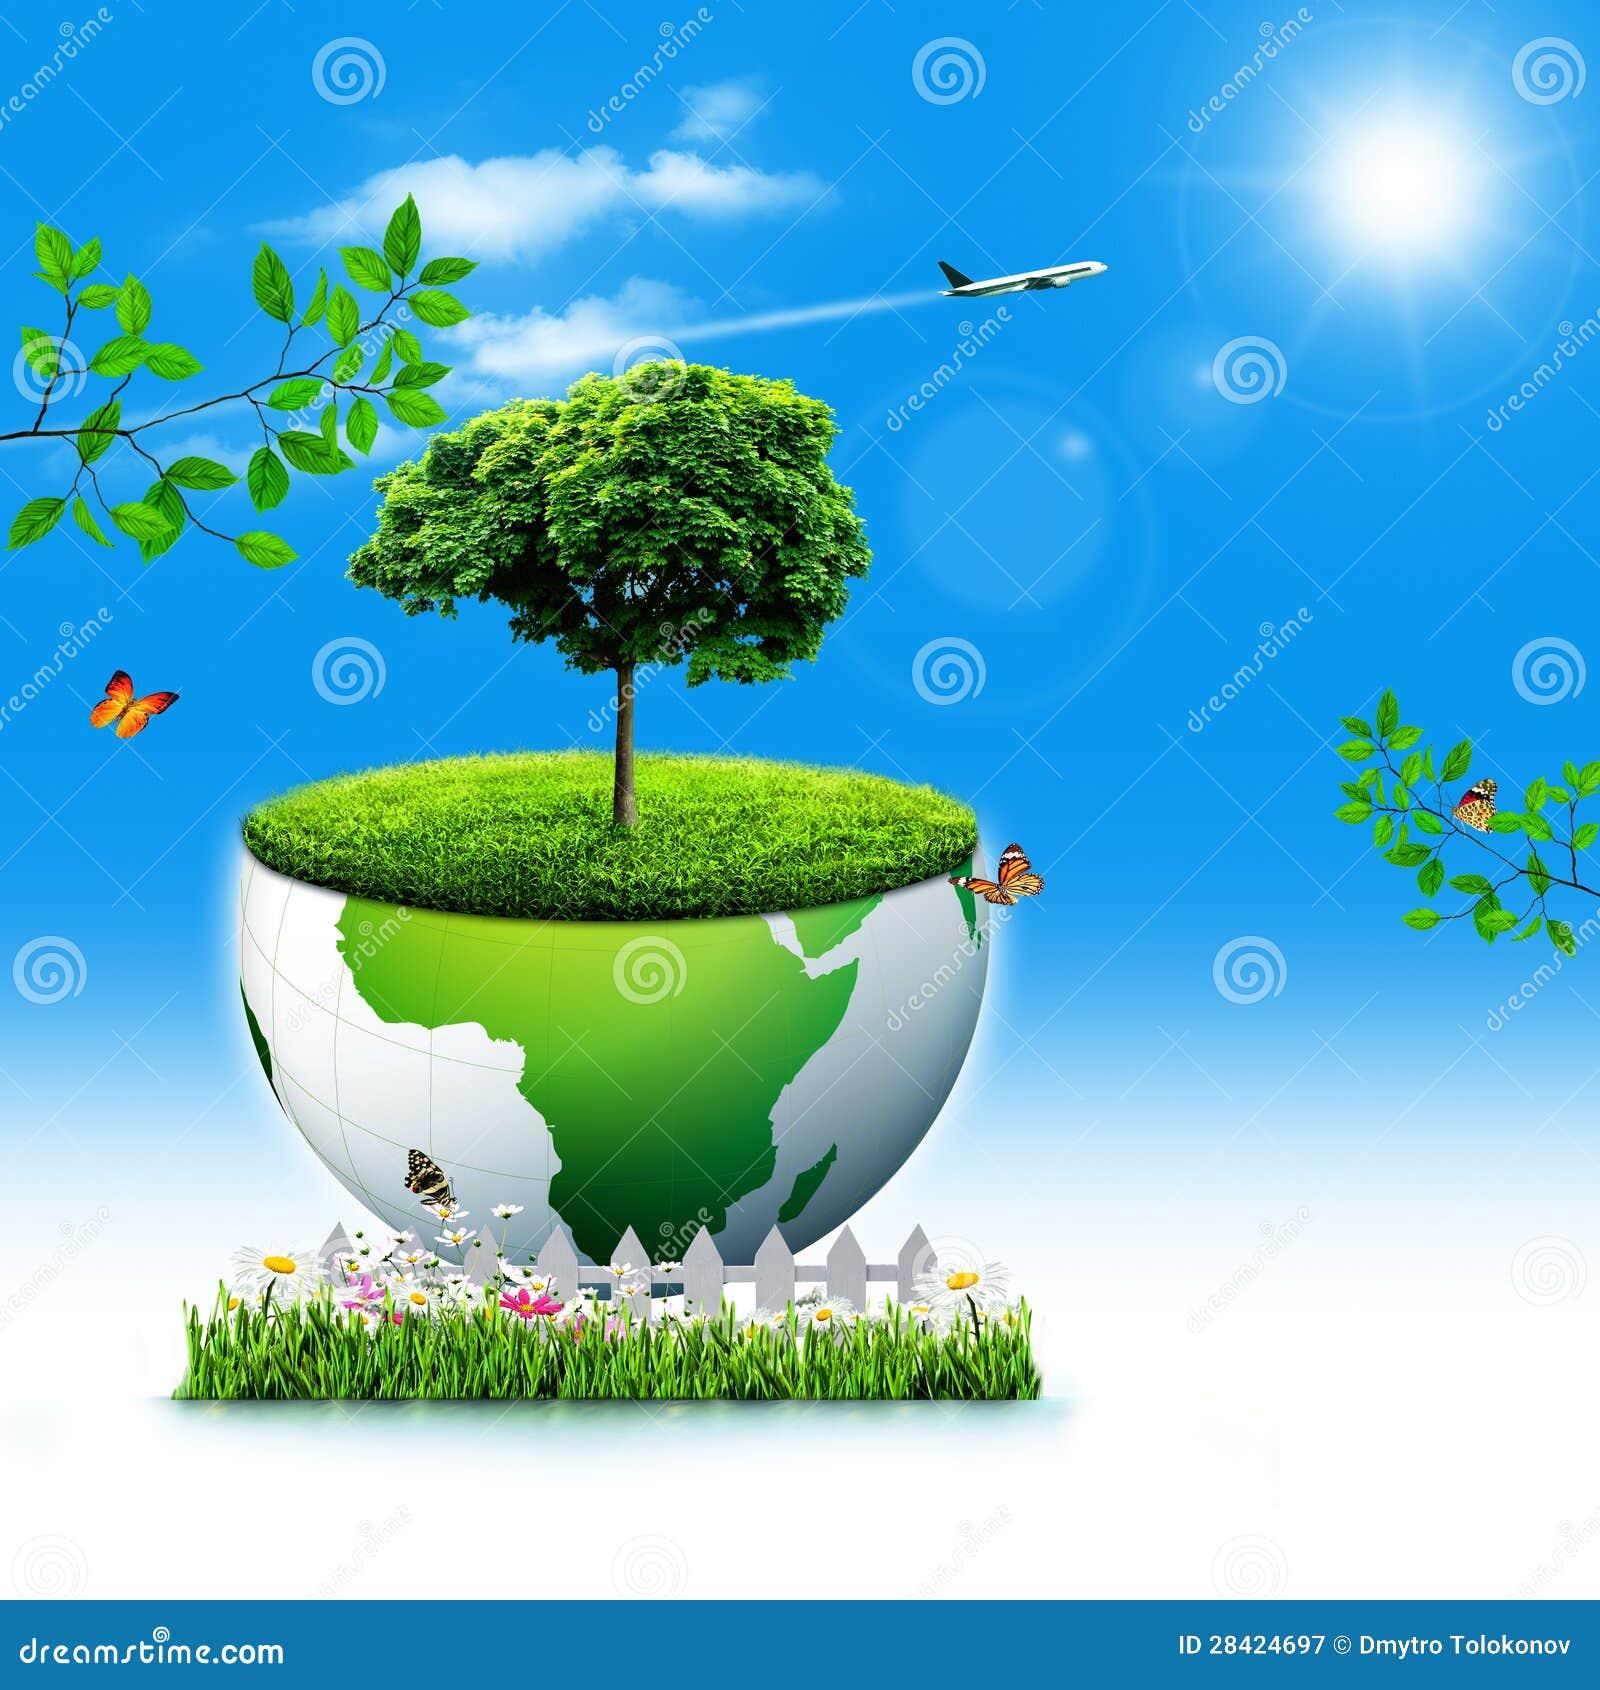 global warming persuasive essays